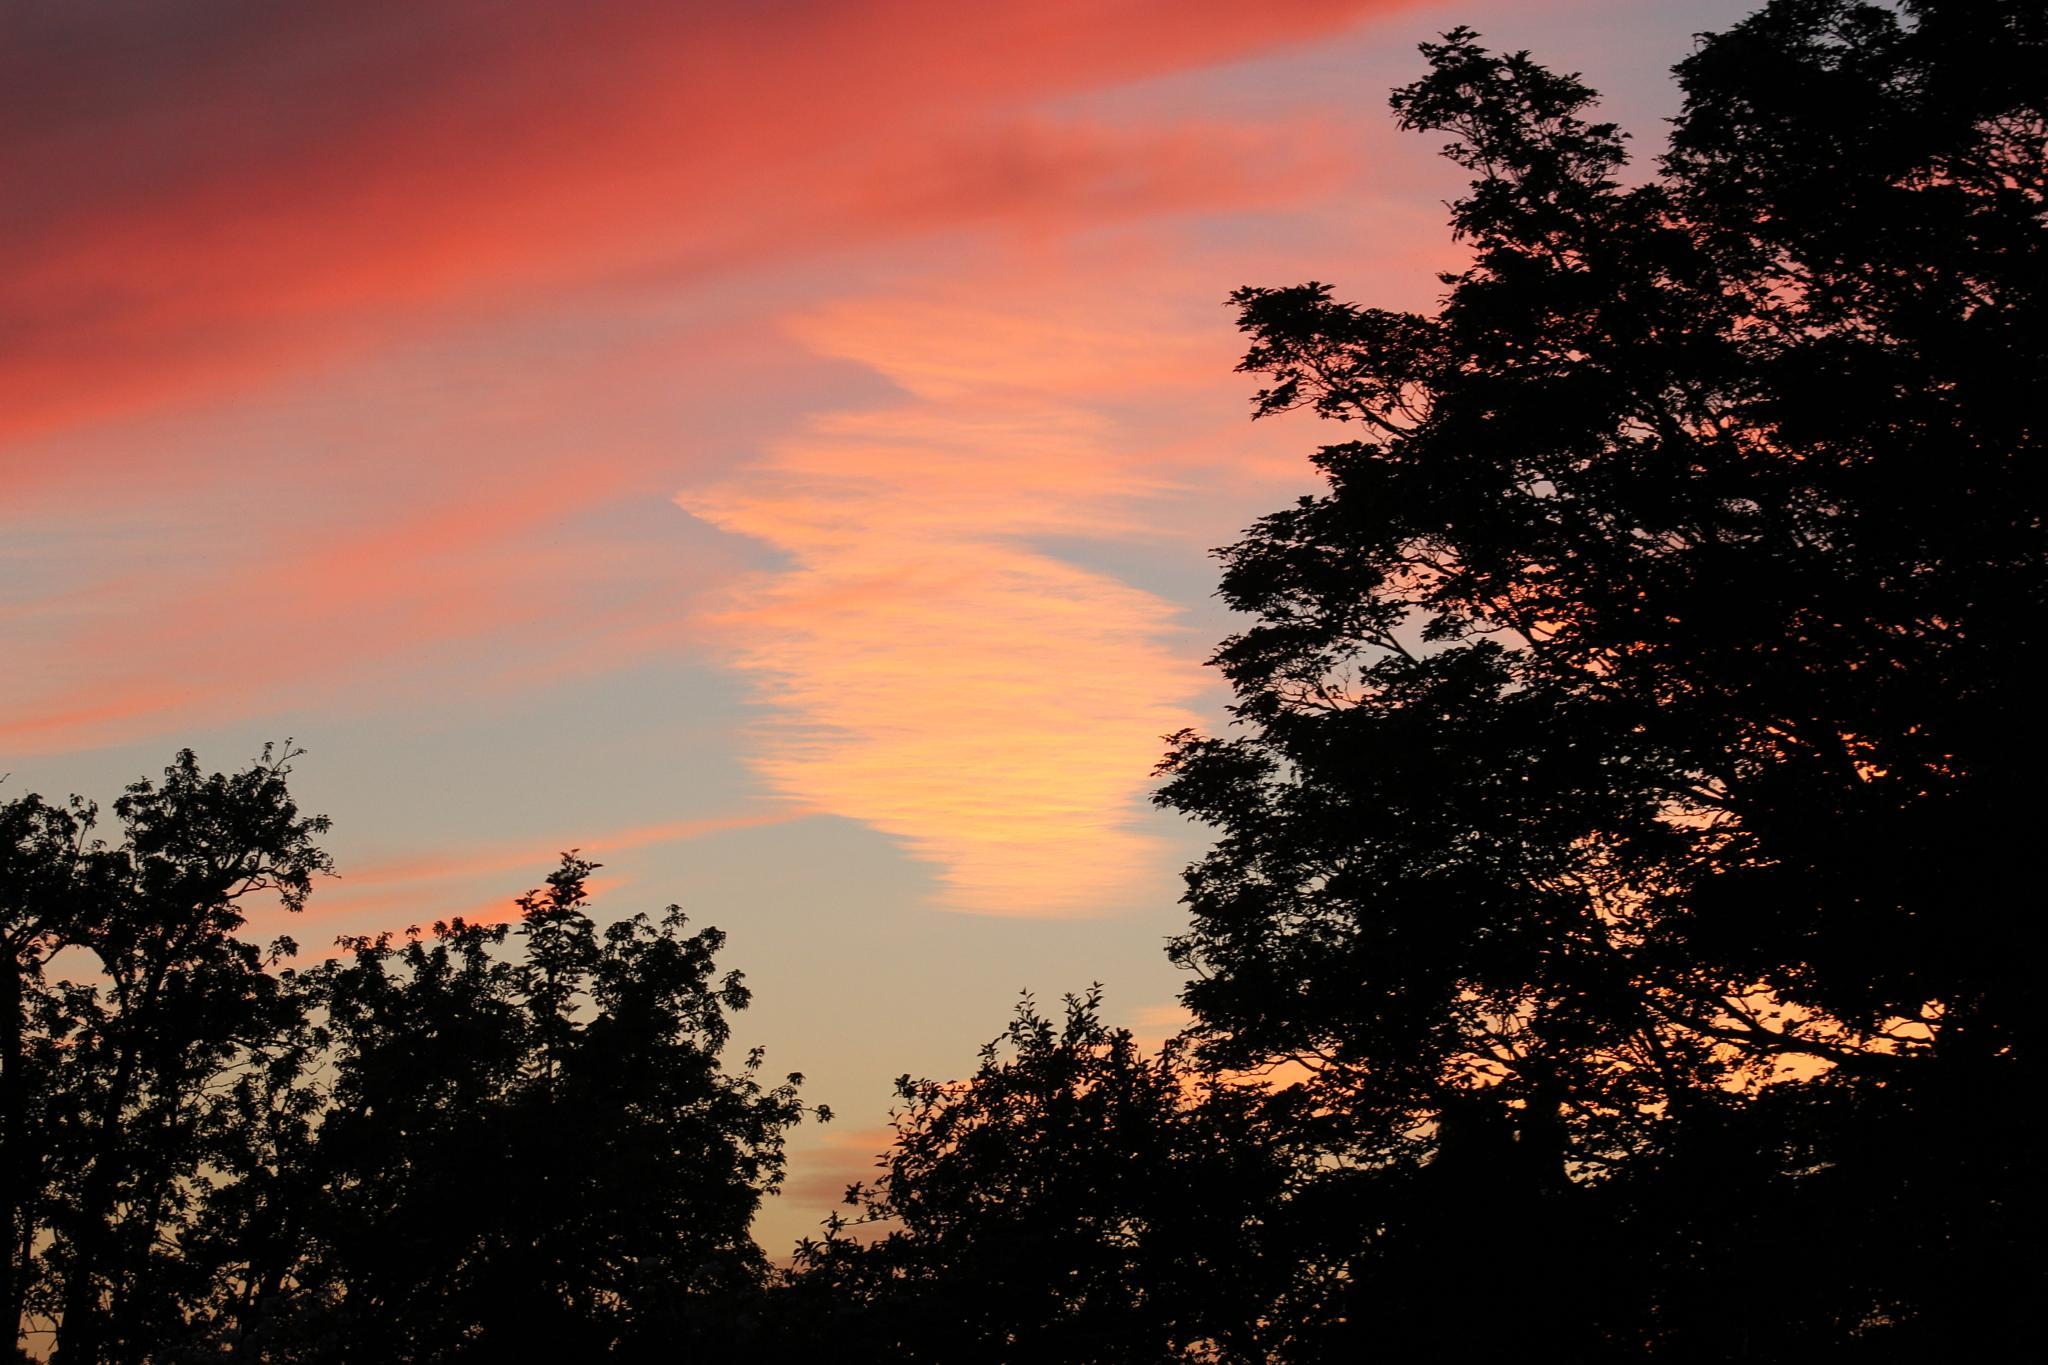 Evening by Sarah Hosking